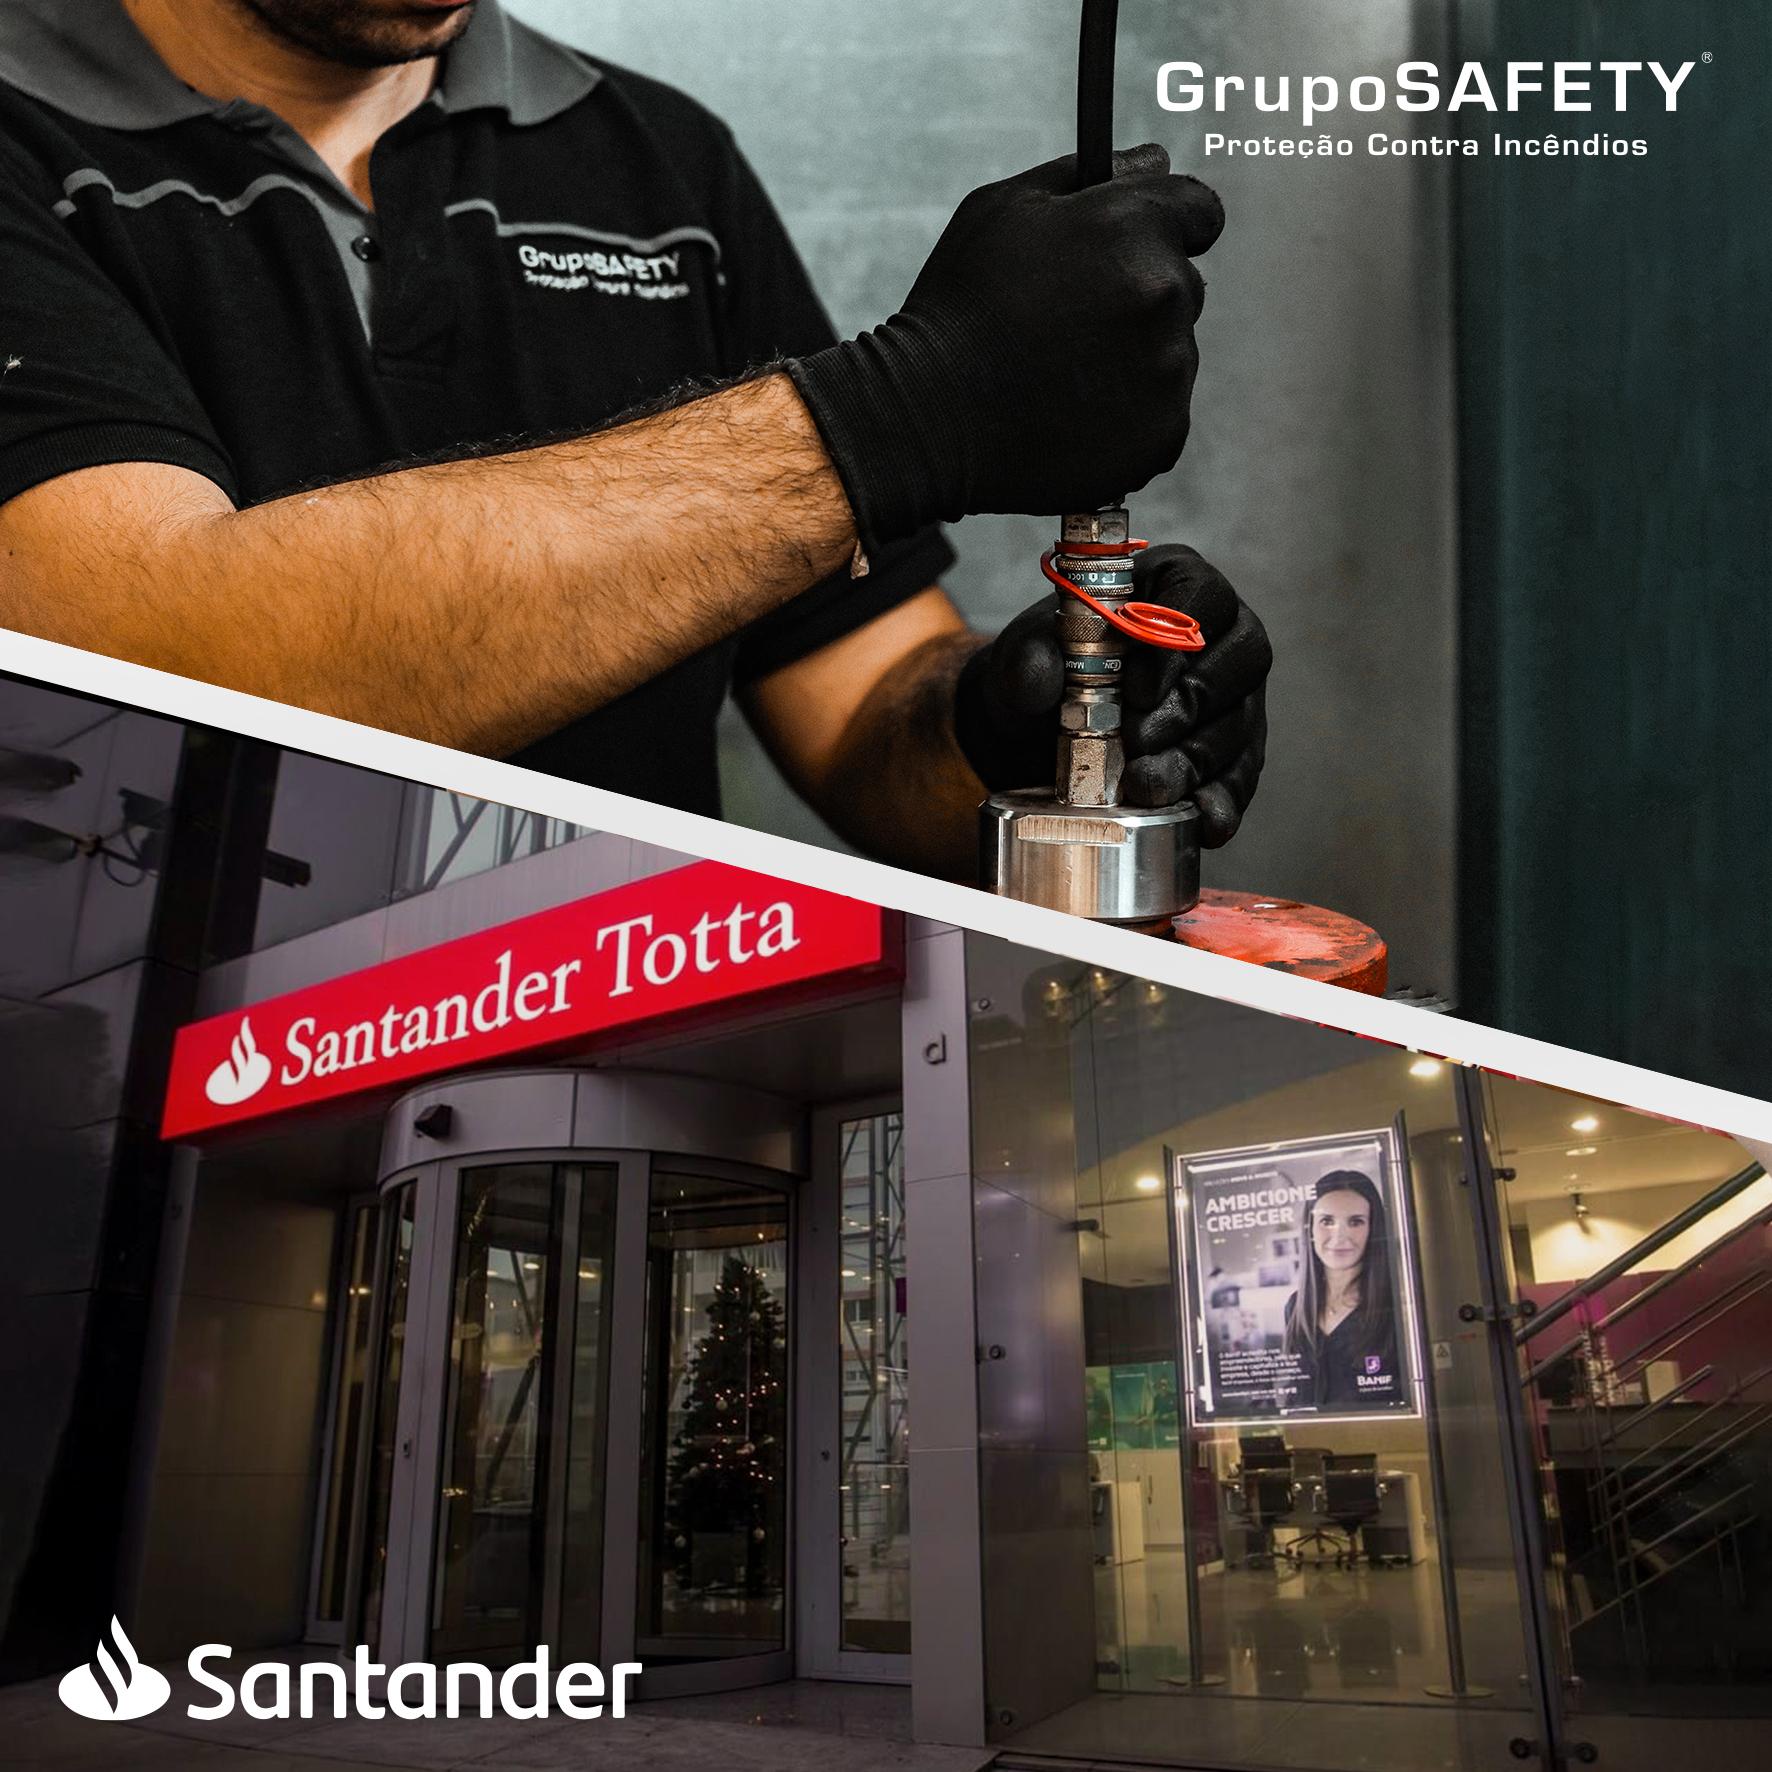 <b> Concurso Público</b> - Banco Santander Totta S.A.